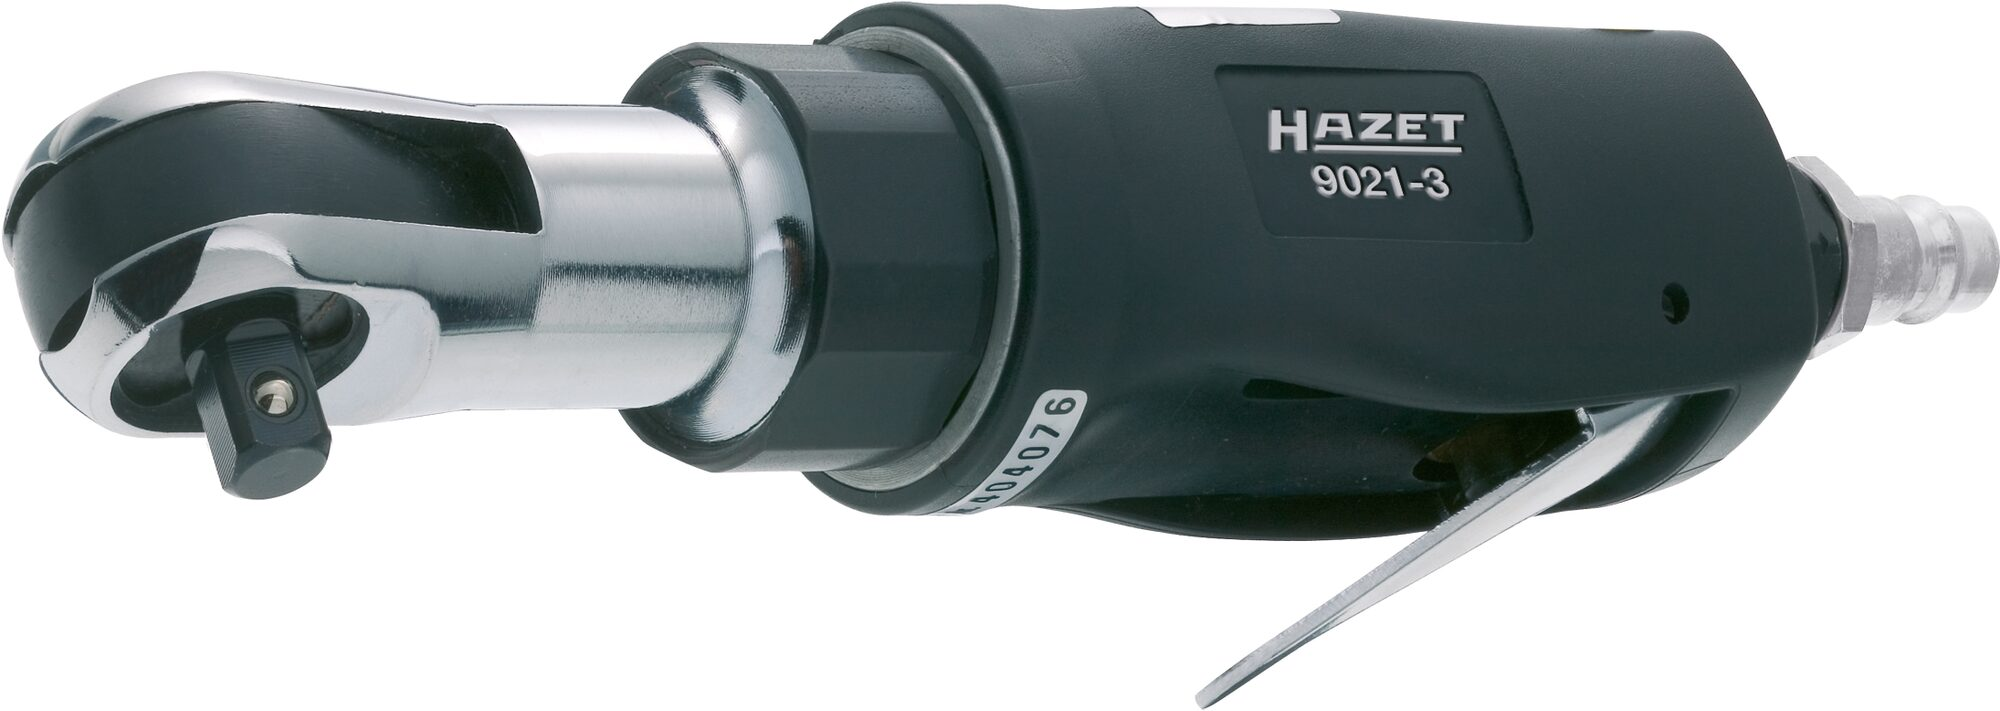 HAZET Ratschenschrauber 9021-3 ∙ Vierkant massiv 10 mm (3/8 Zoll)